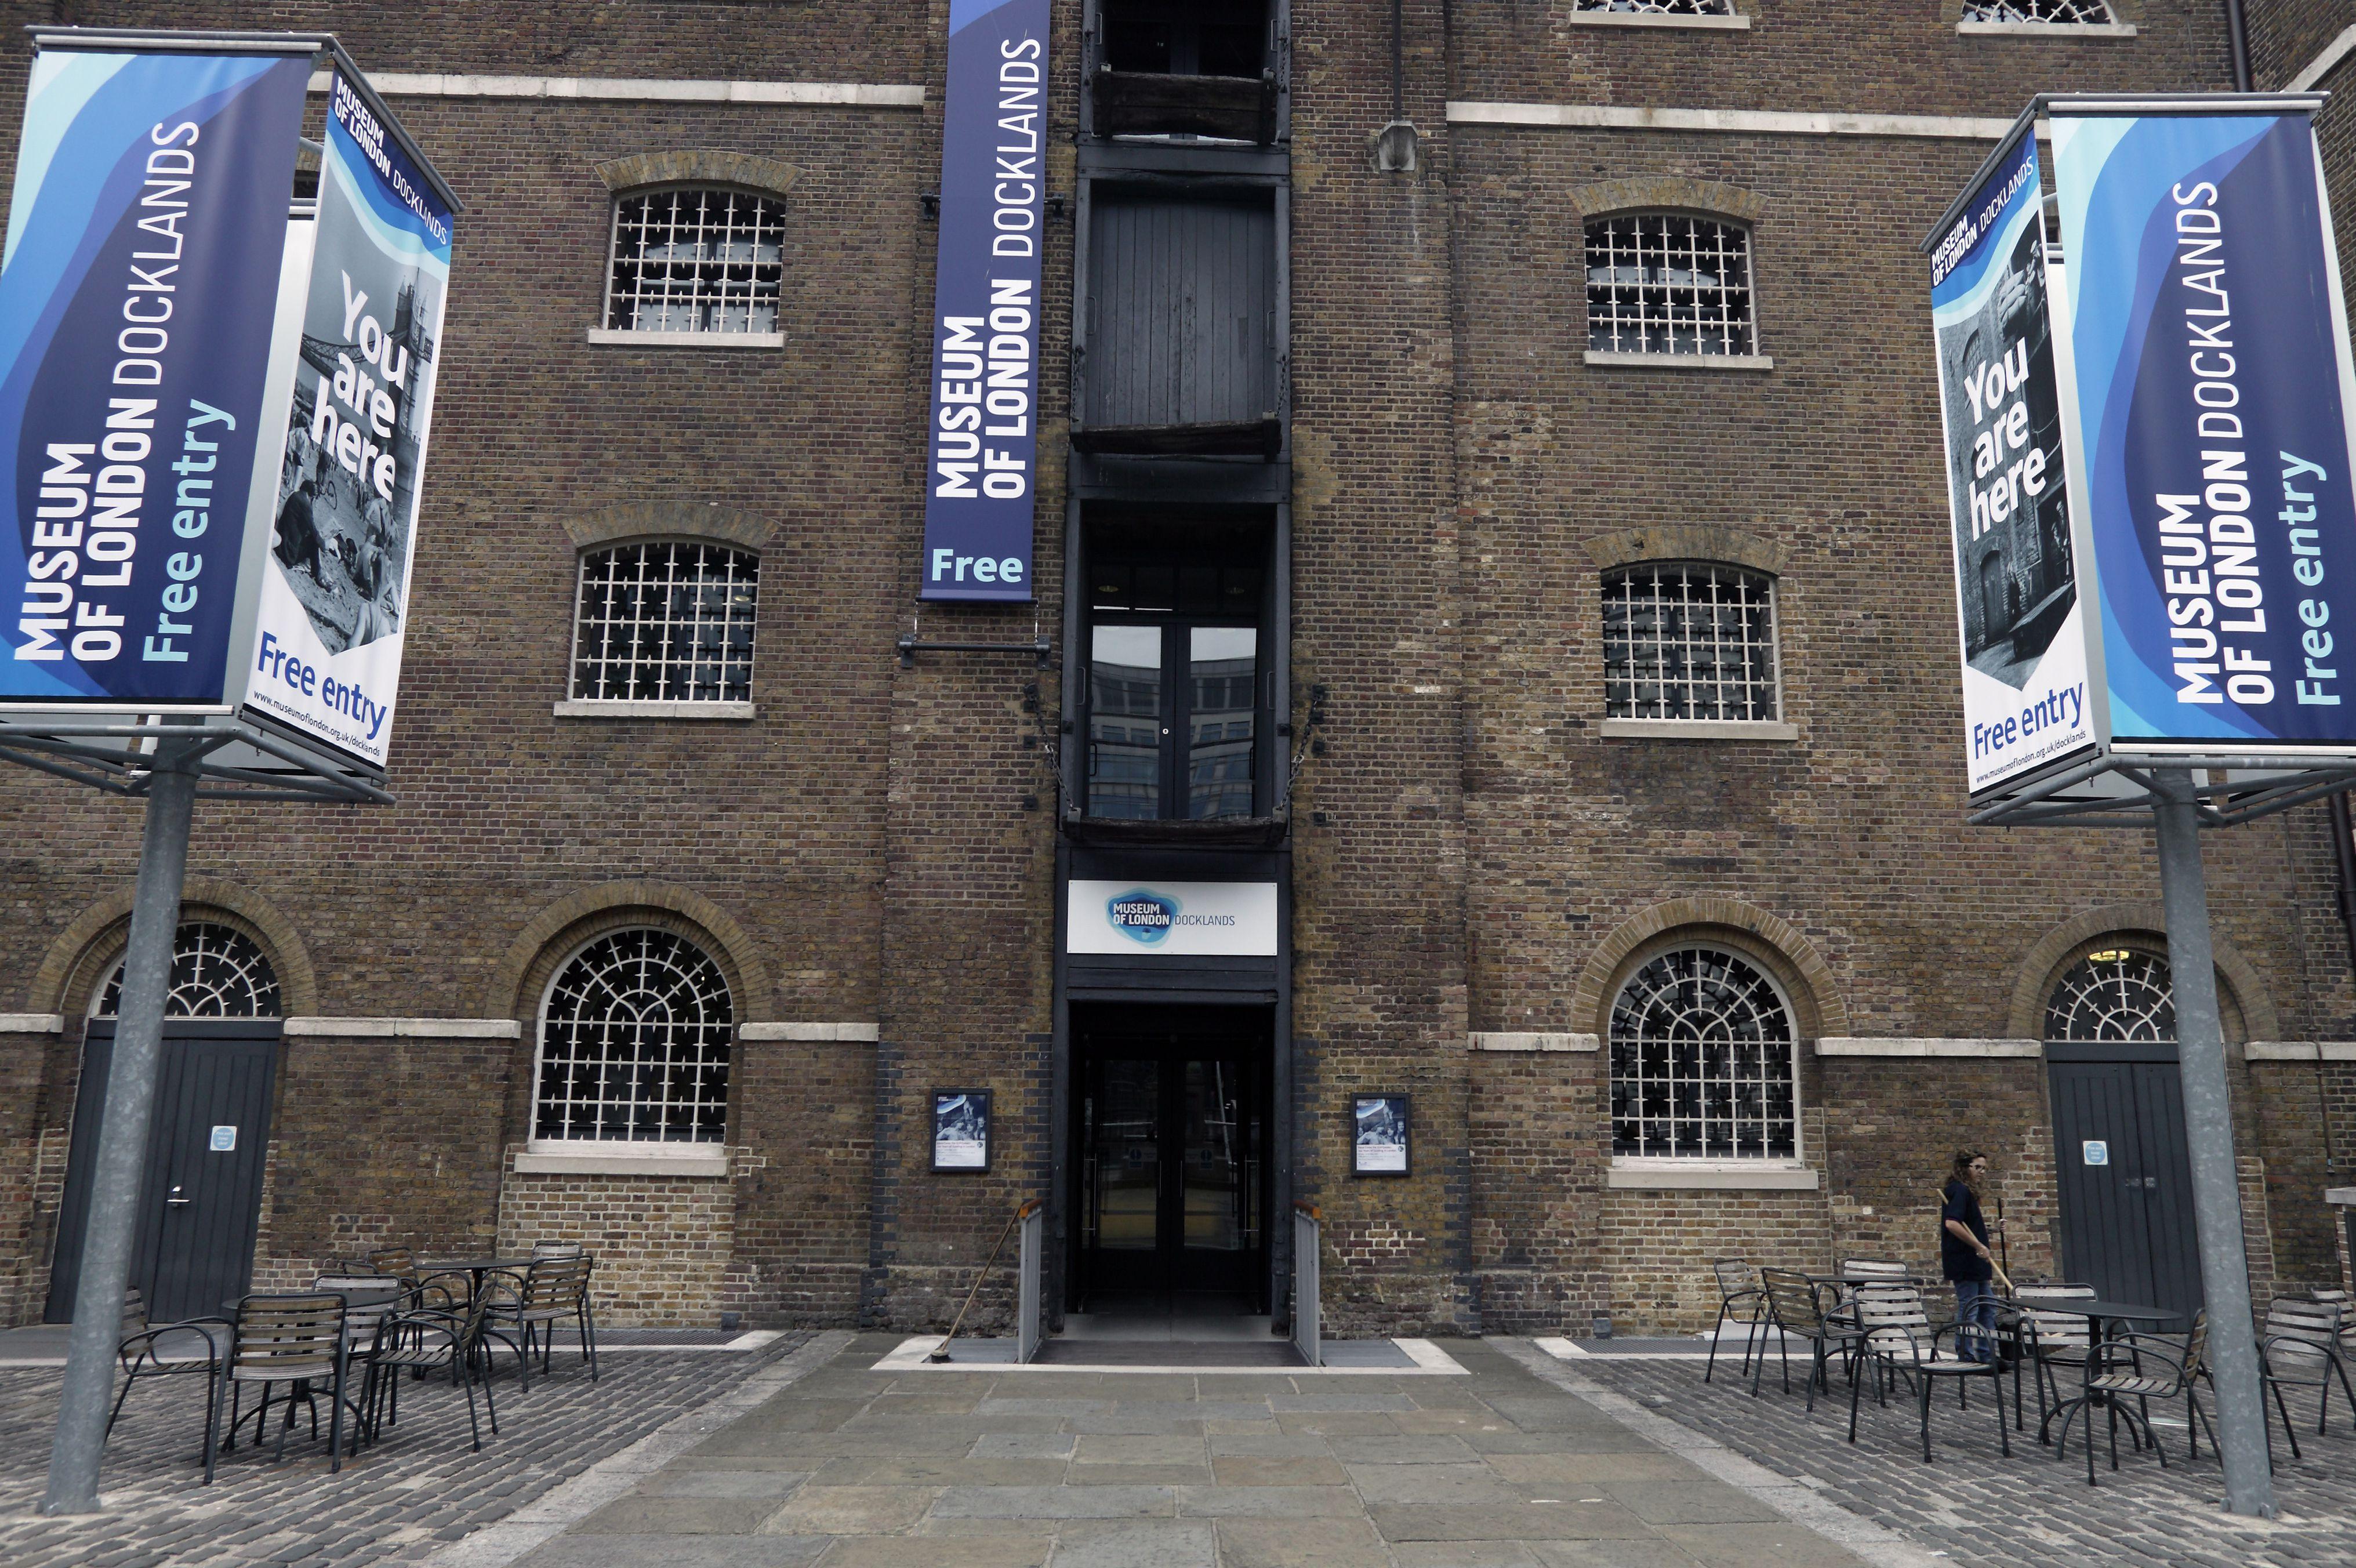 Museum of London Docklands.